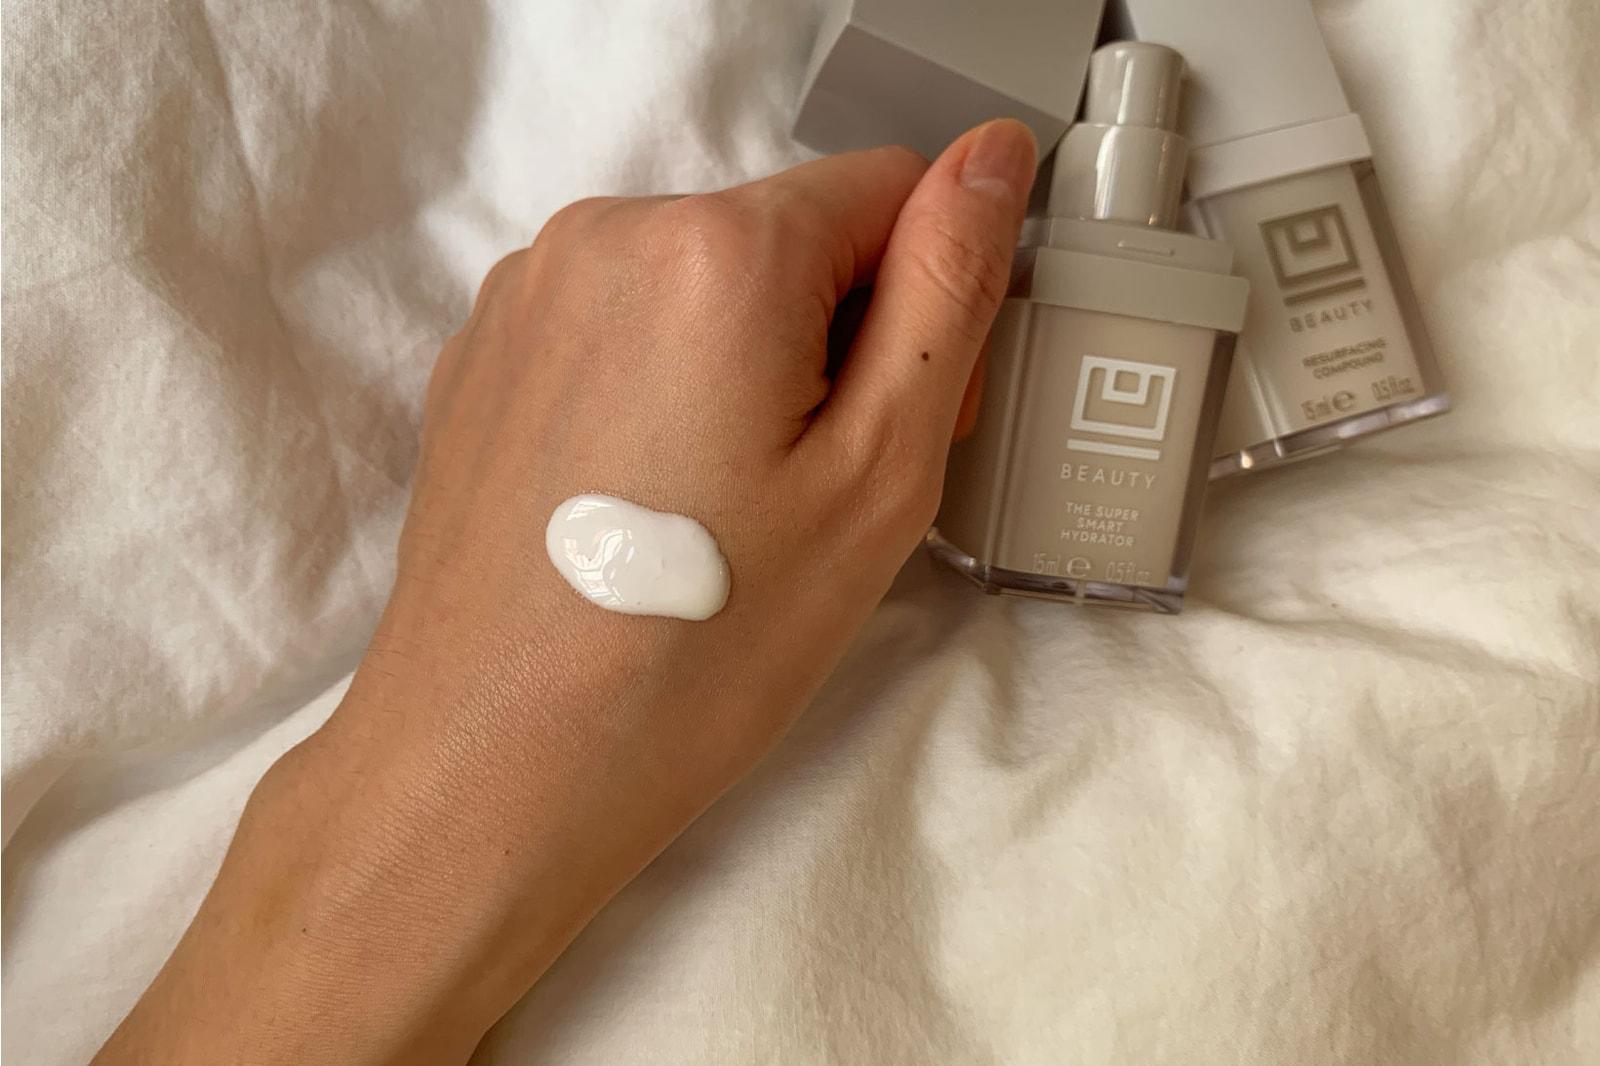 u beauty super smart hydrator skincare moisturizers creams